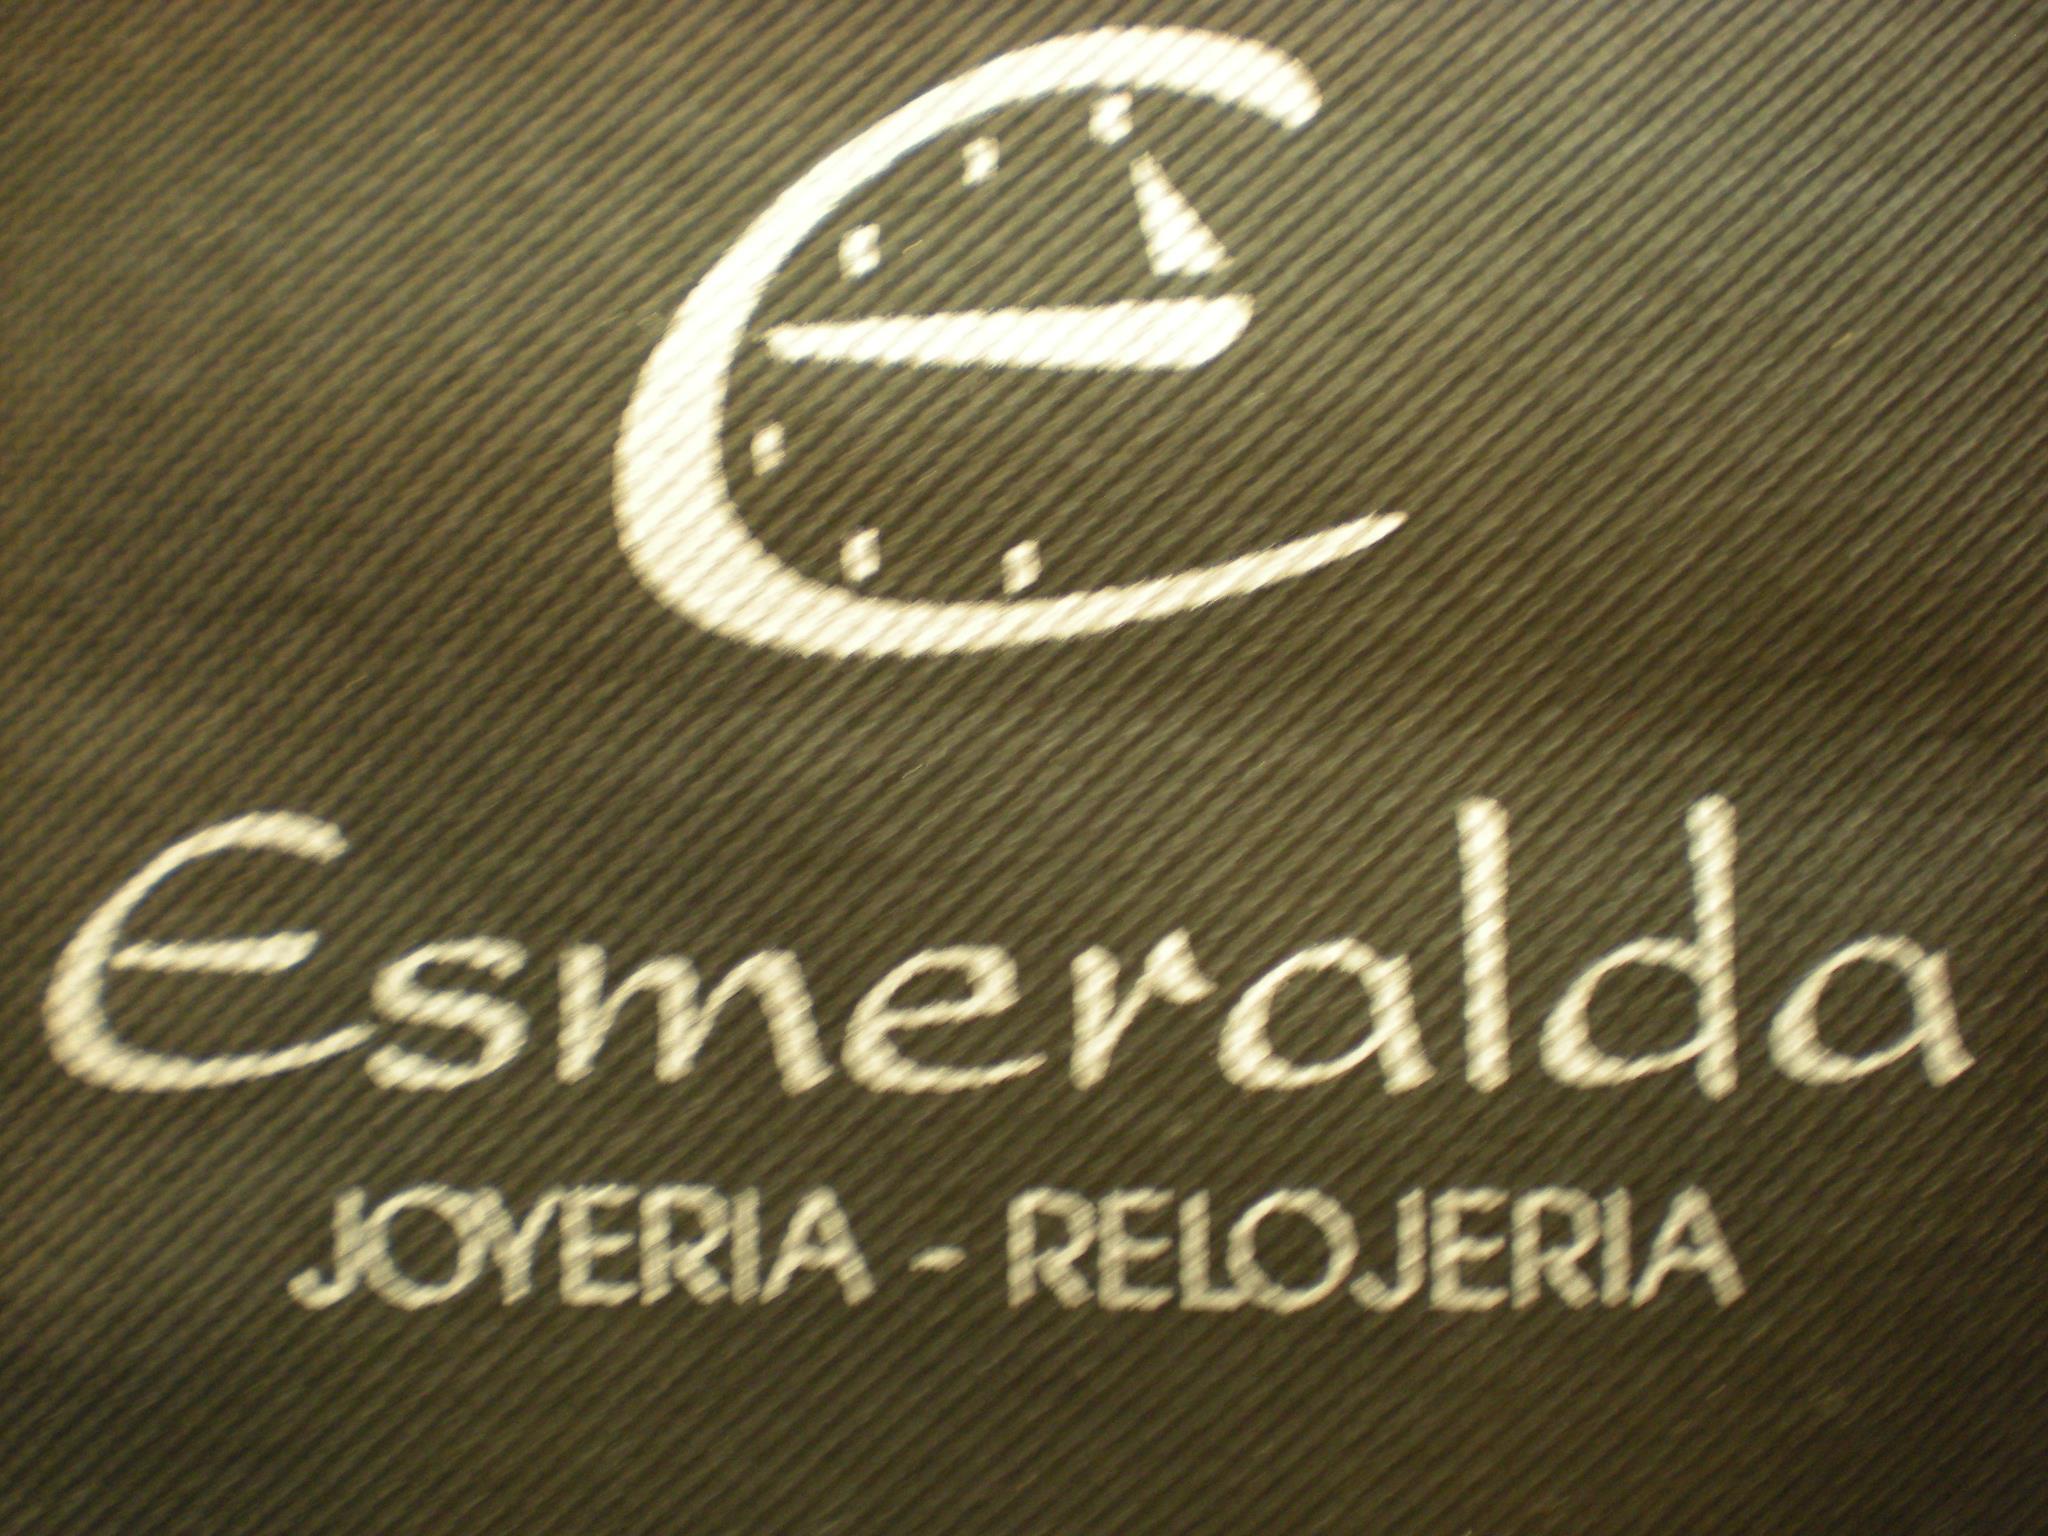 logo-joyeria-esmeralda